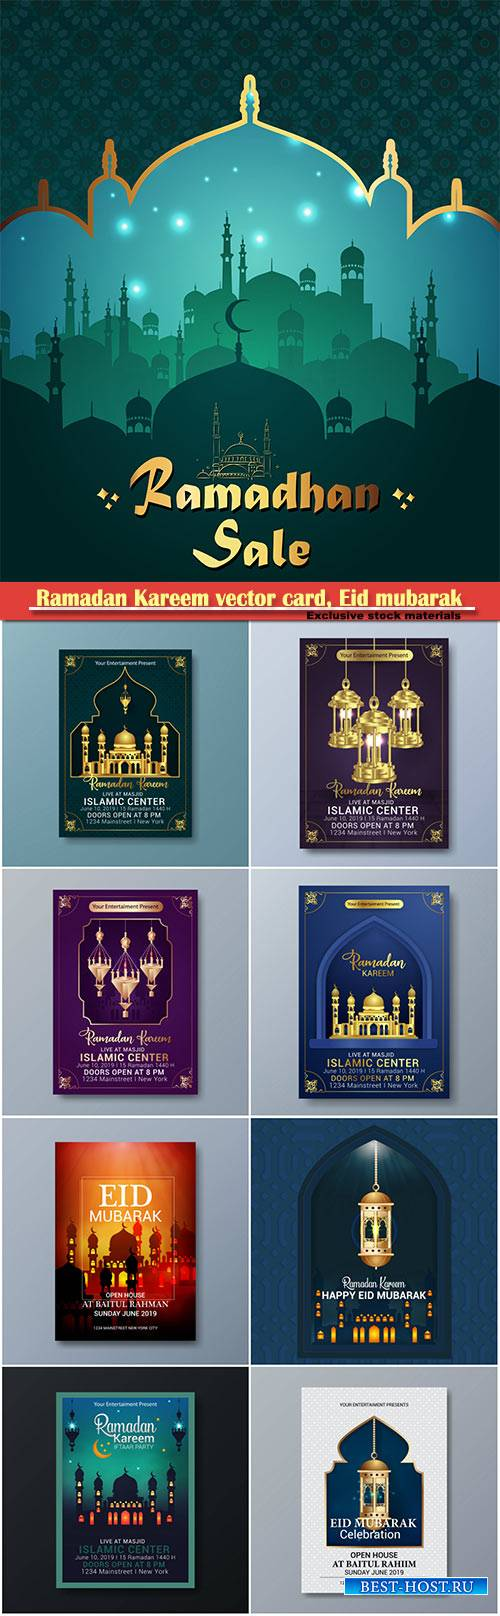 Ramadan Kareem vector card, Eid mubarak calligraphy design templates